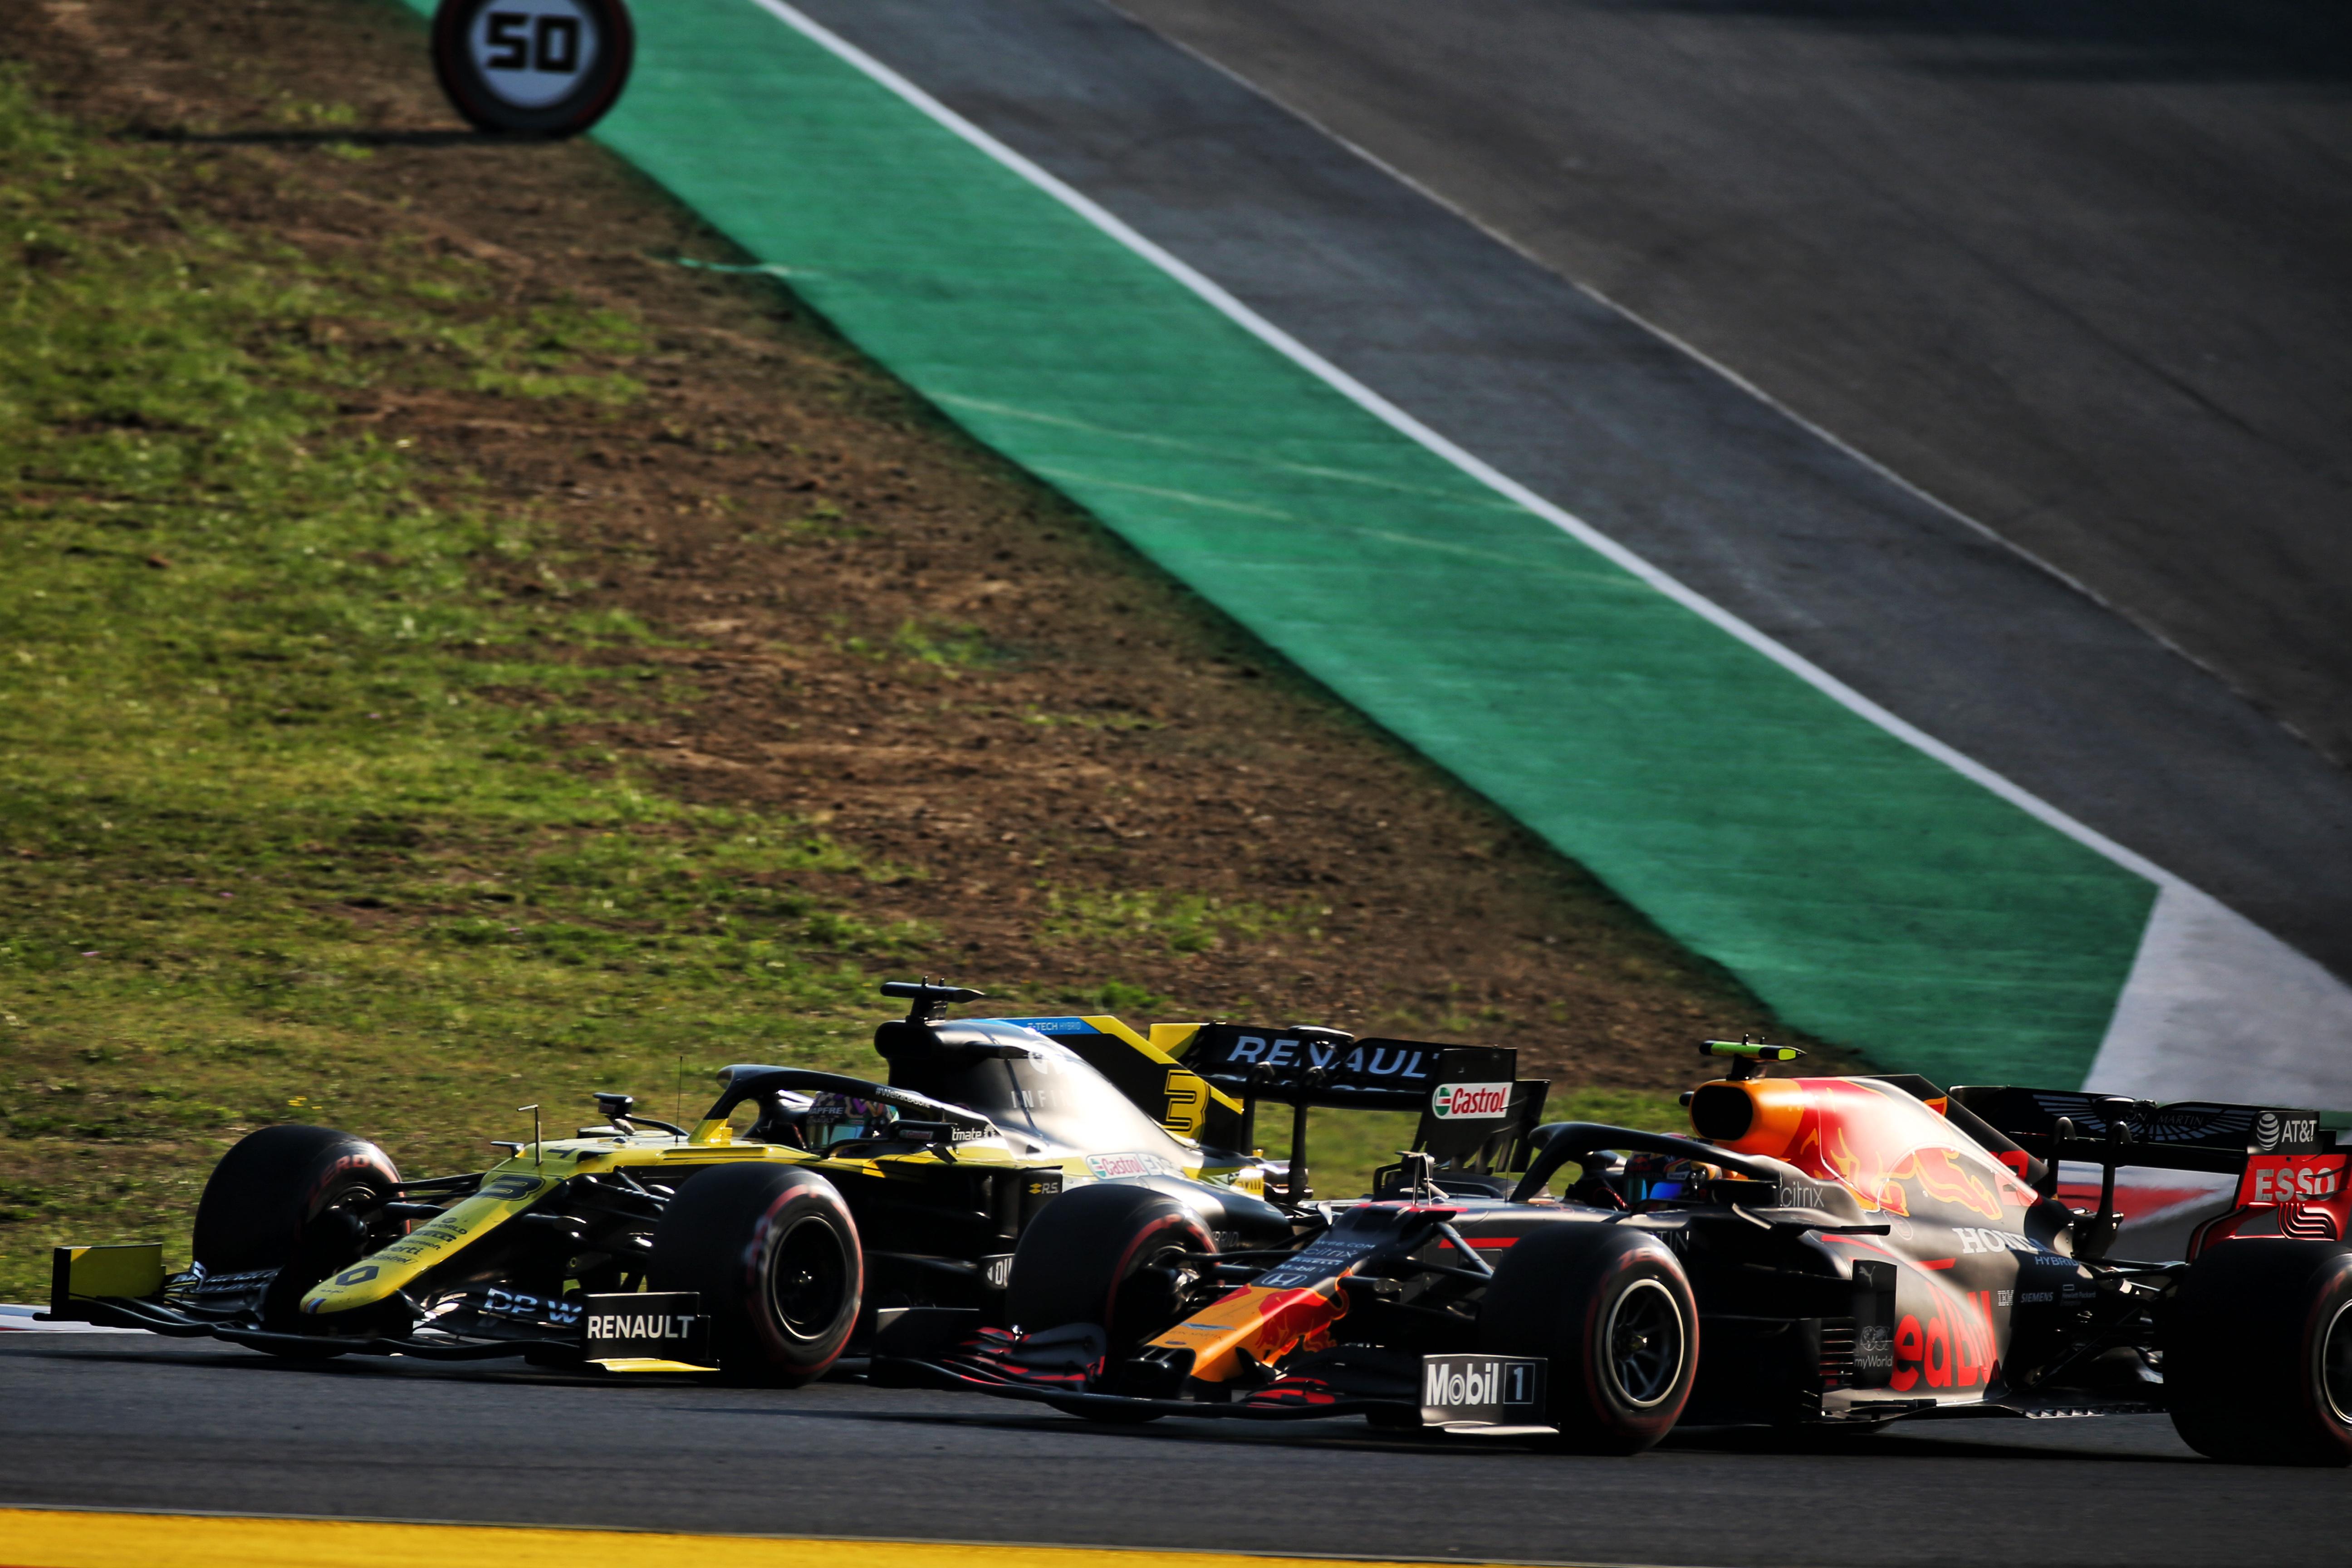 Alex Albon Red Bull Daniel Ricciardo Renault Mugello 2020